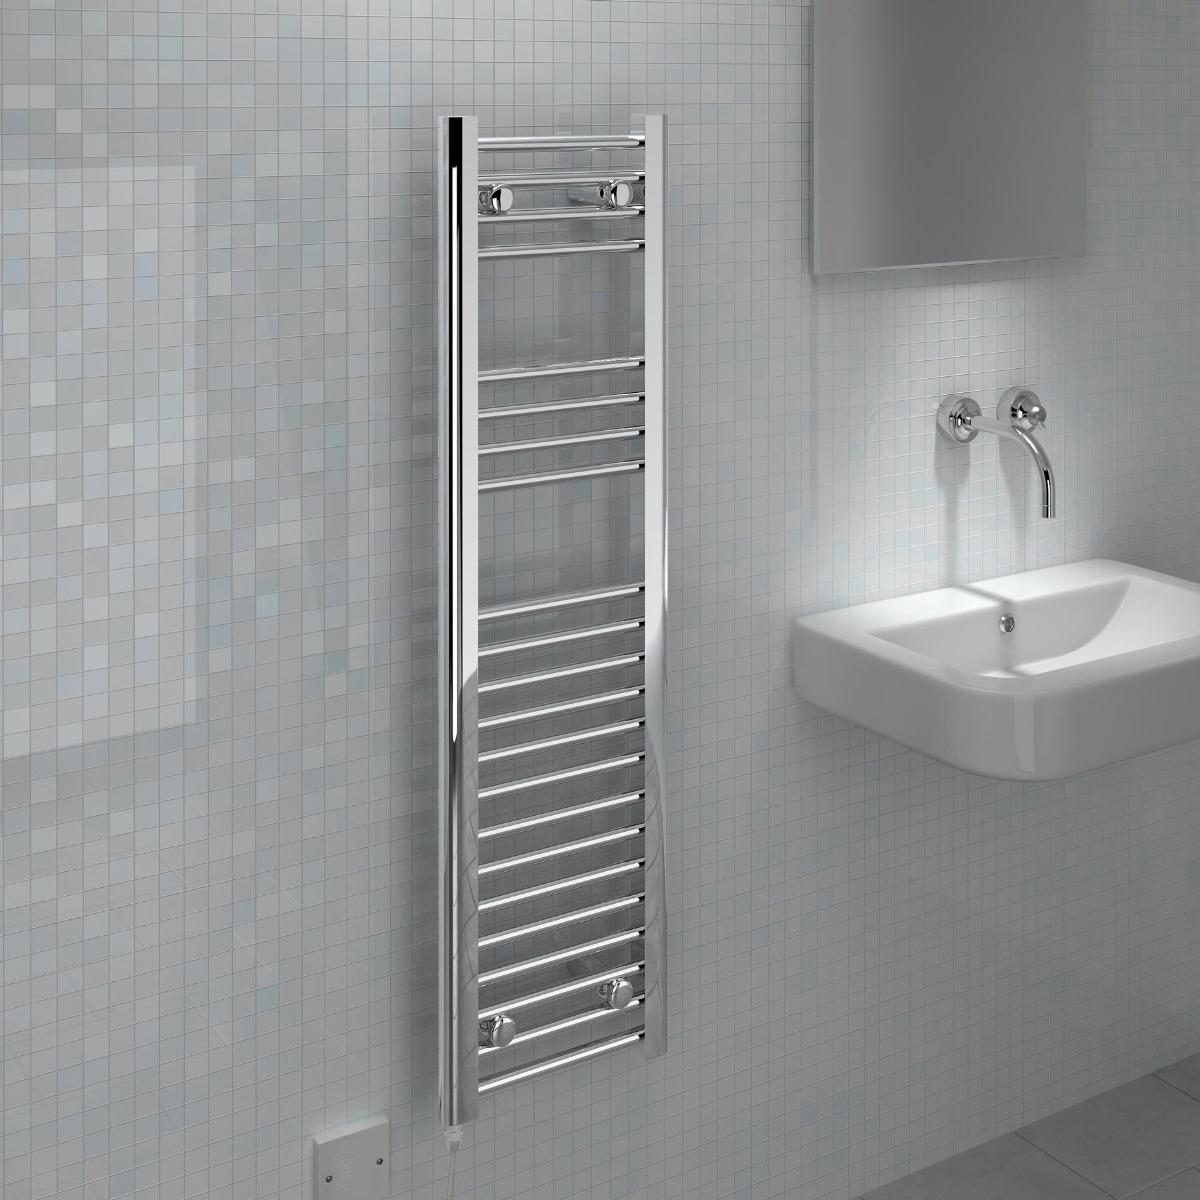 Fina-E 150W electric towel rail